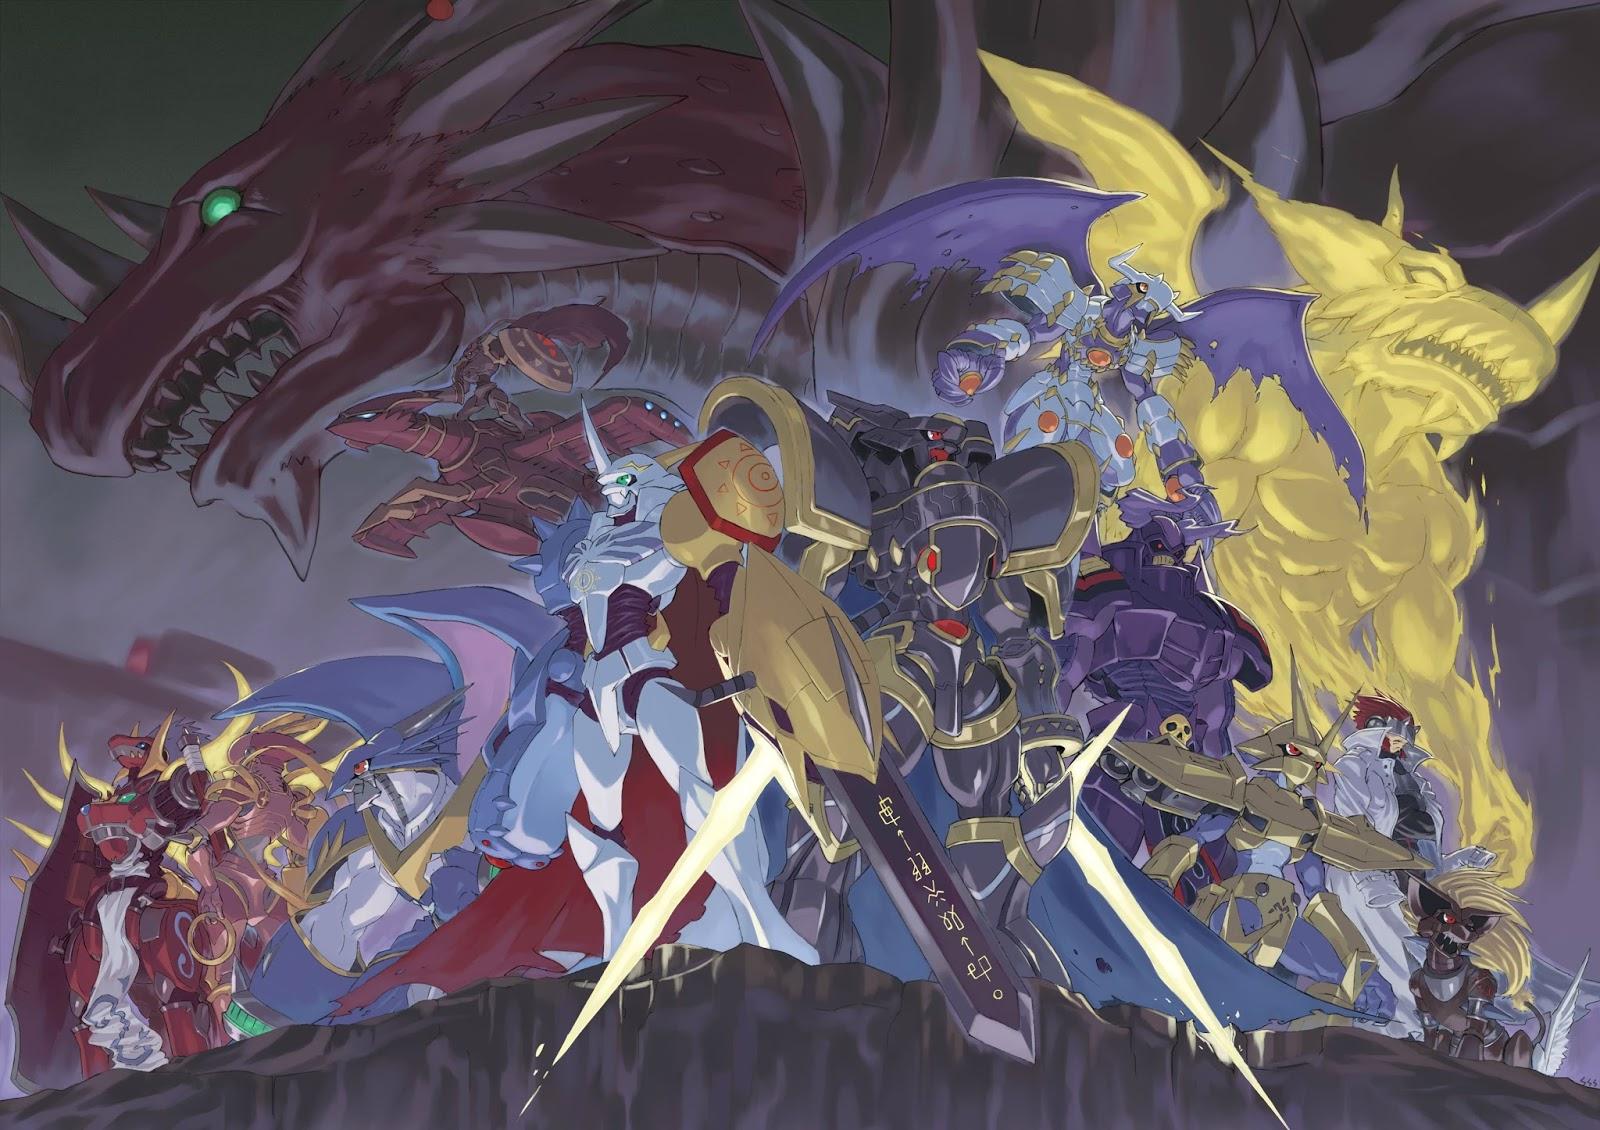 Digimon Royal Knight HD Wallpaper is free HD Wallpaper. This wallpaper ...